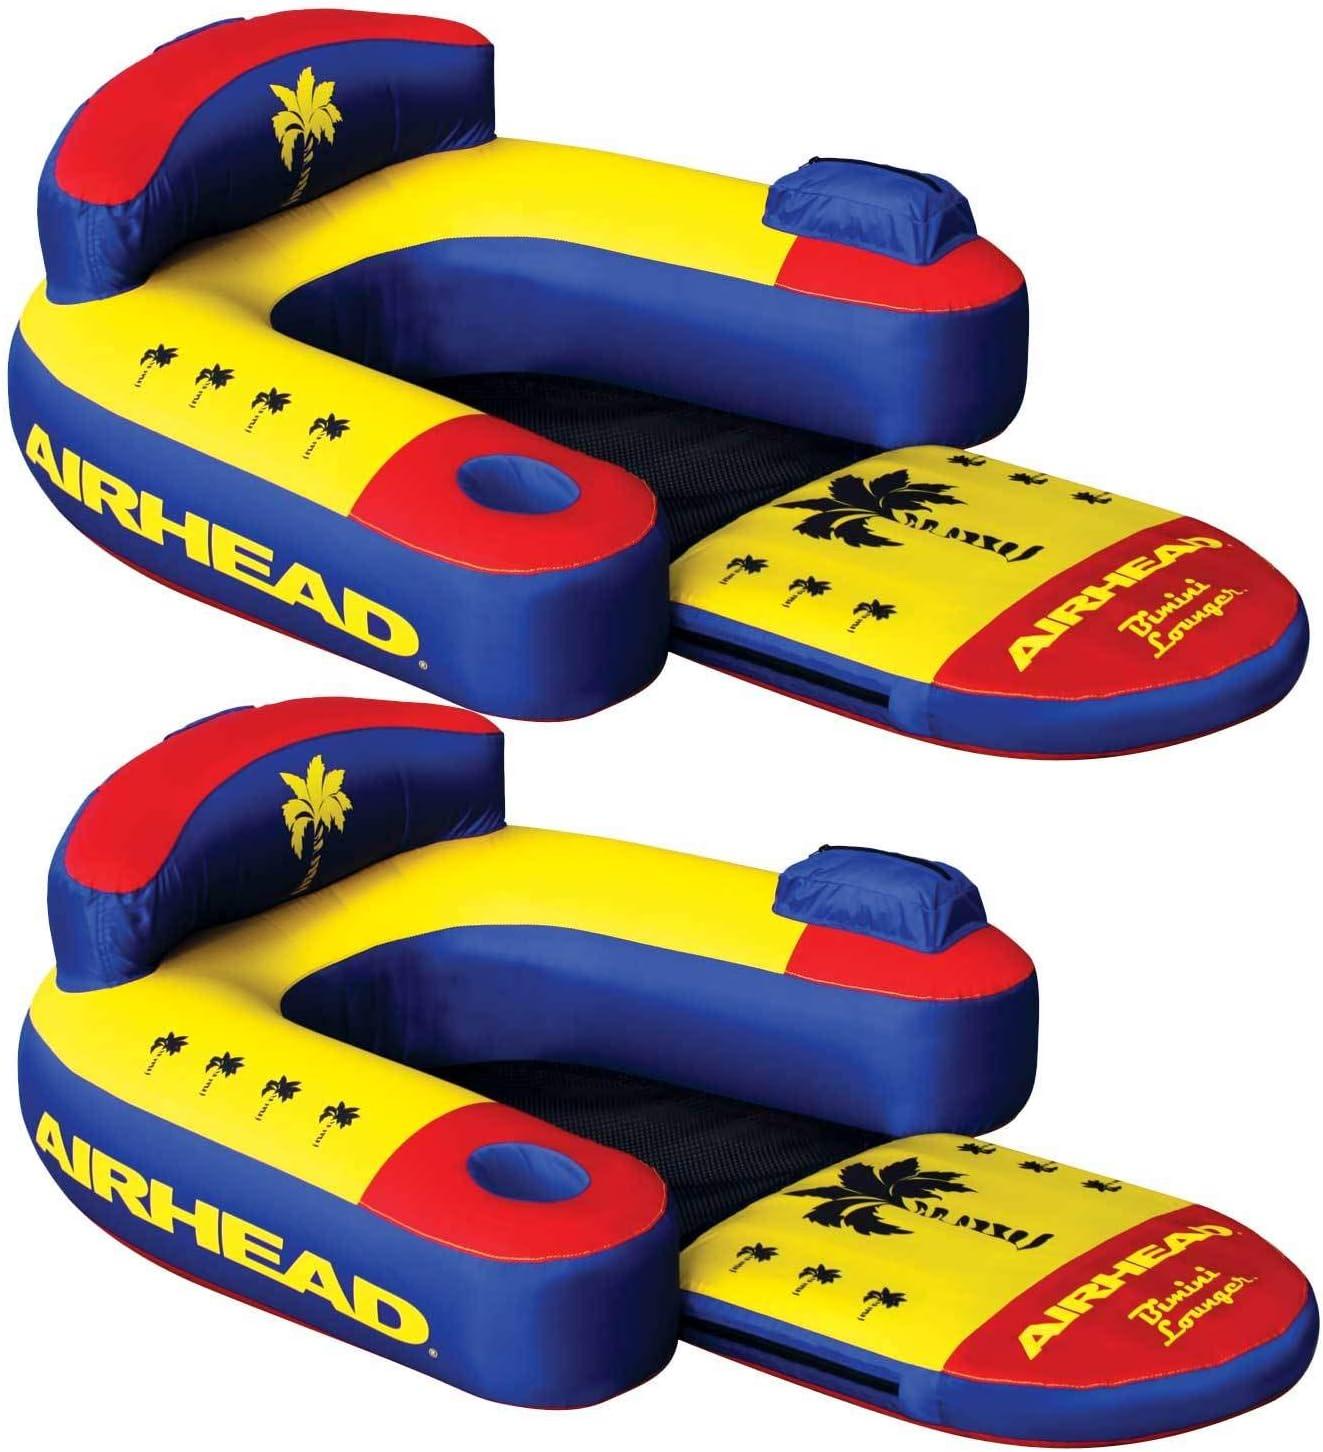 Airhead Bimini Lounger II Single Person Inflatable Pool Lounge Raft 2 Pack